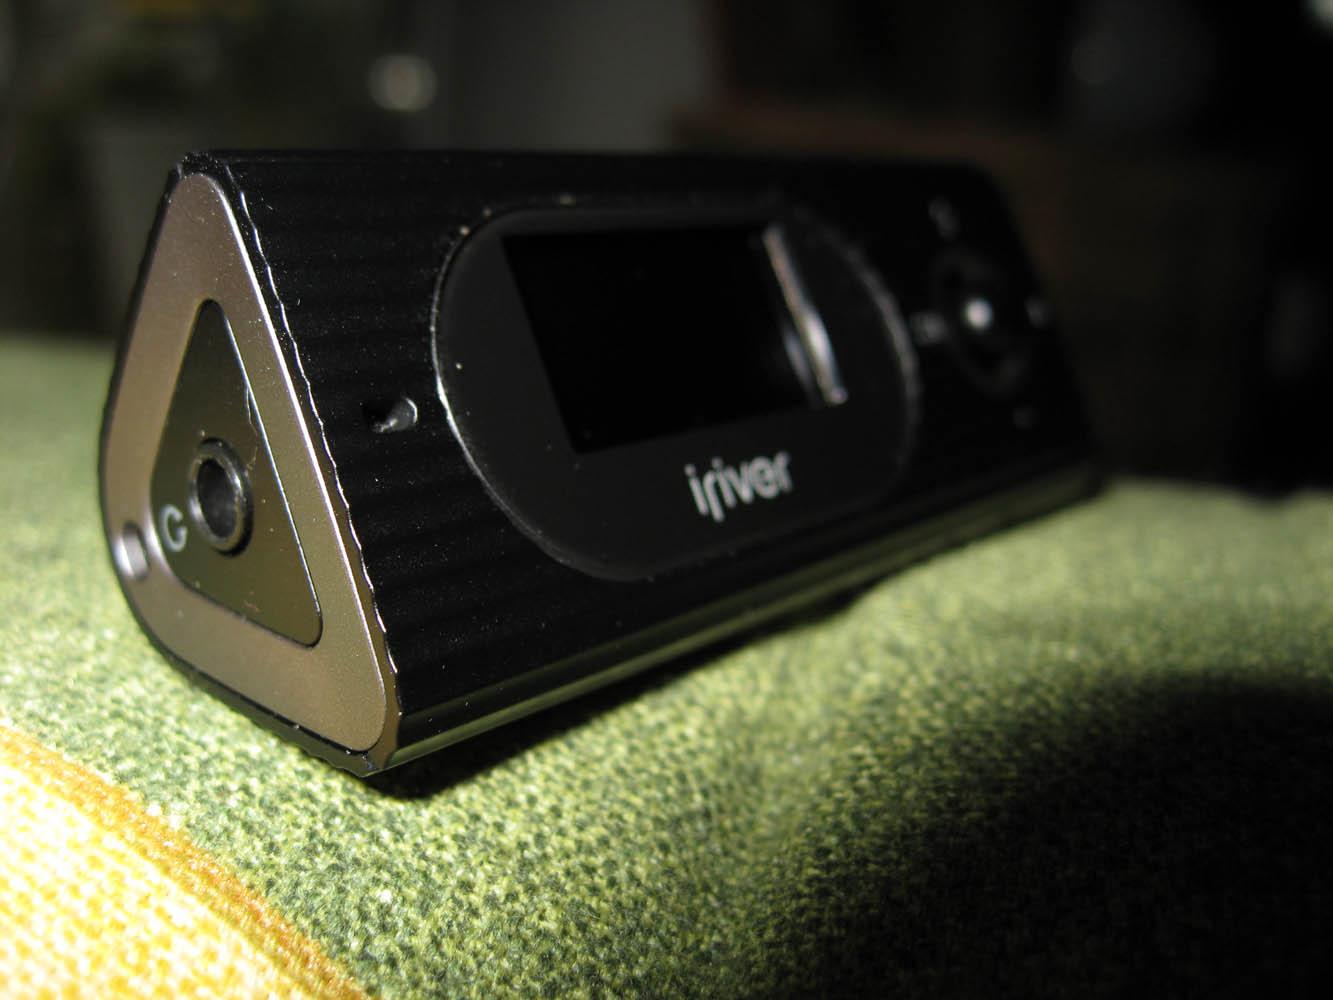 iRiver-T60-3.JPG